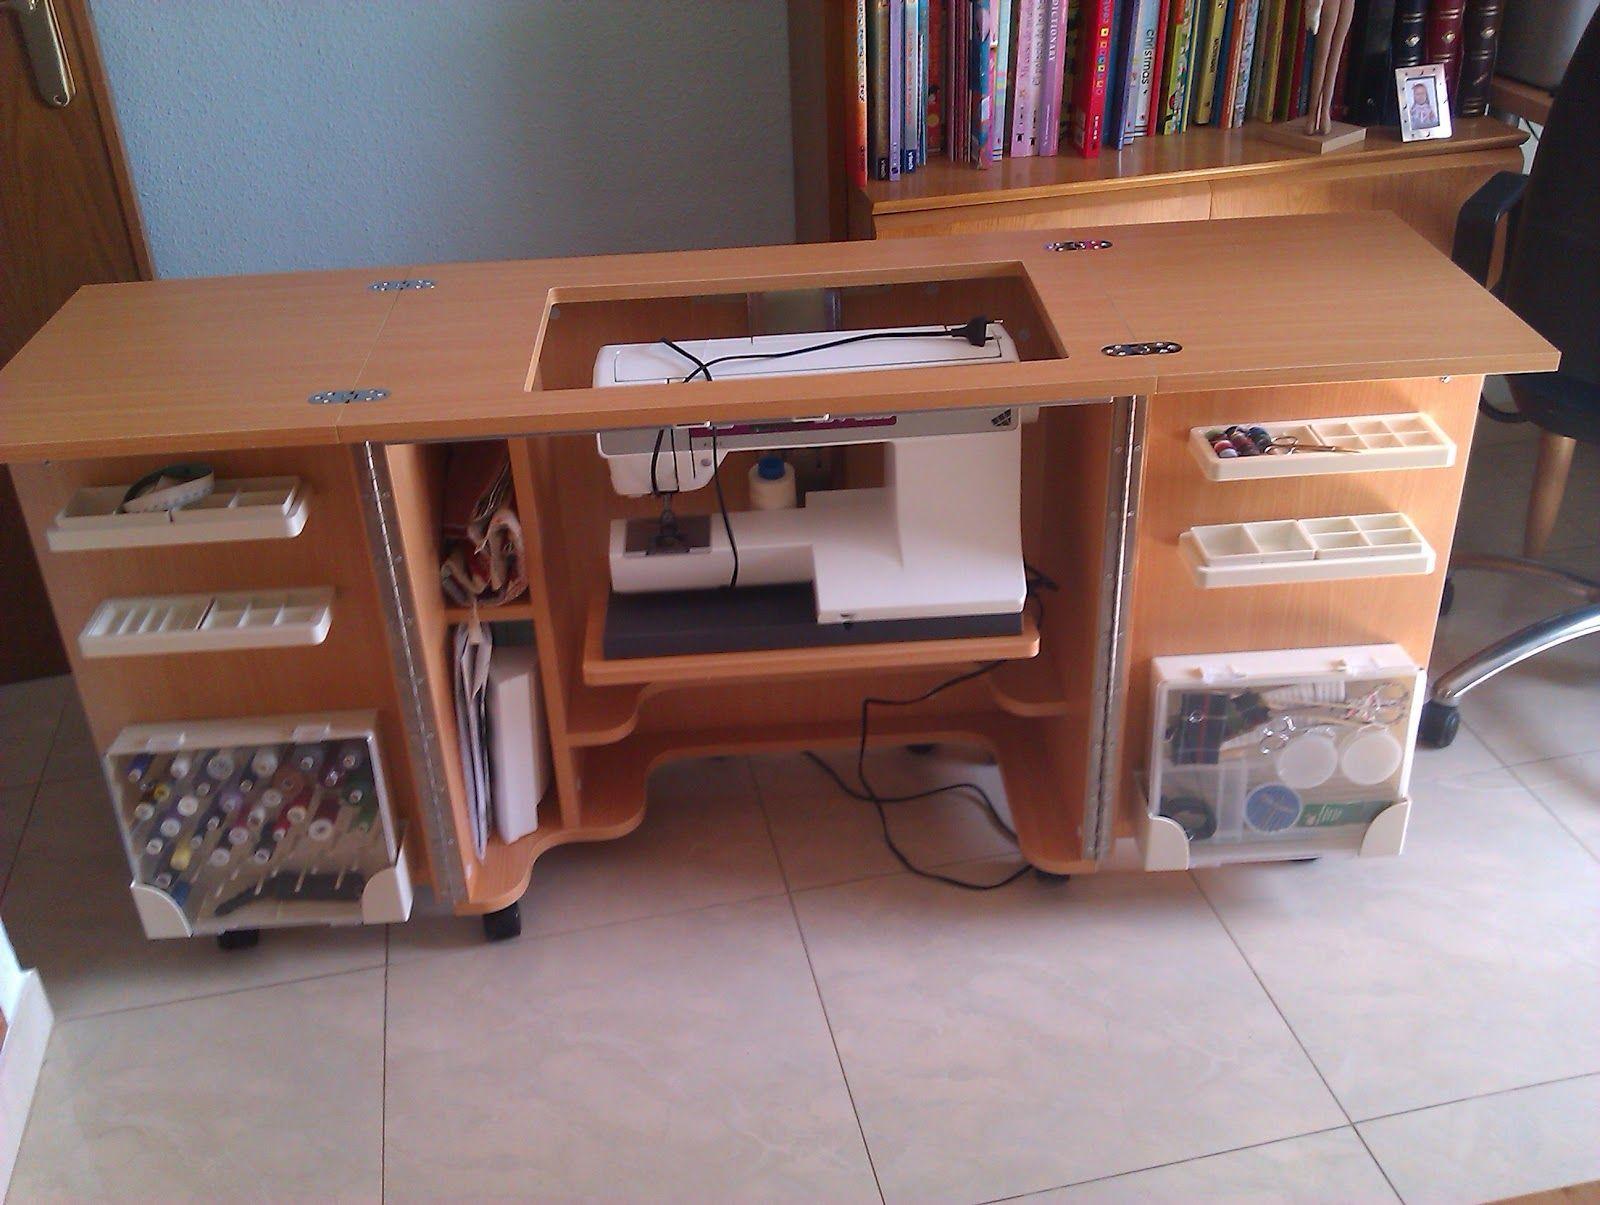 MUEBLE MAQUINA COSER | Muebles maquinas de coser, Muebles